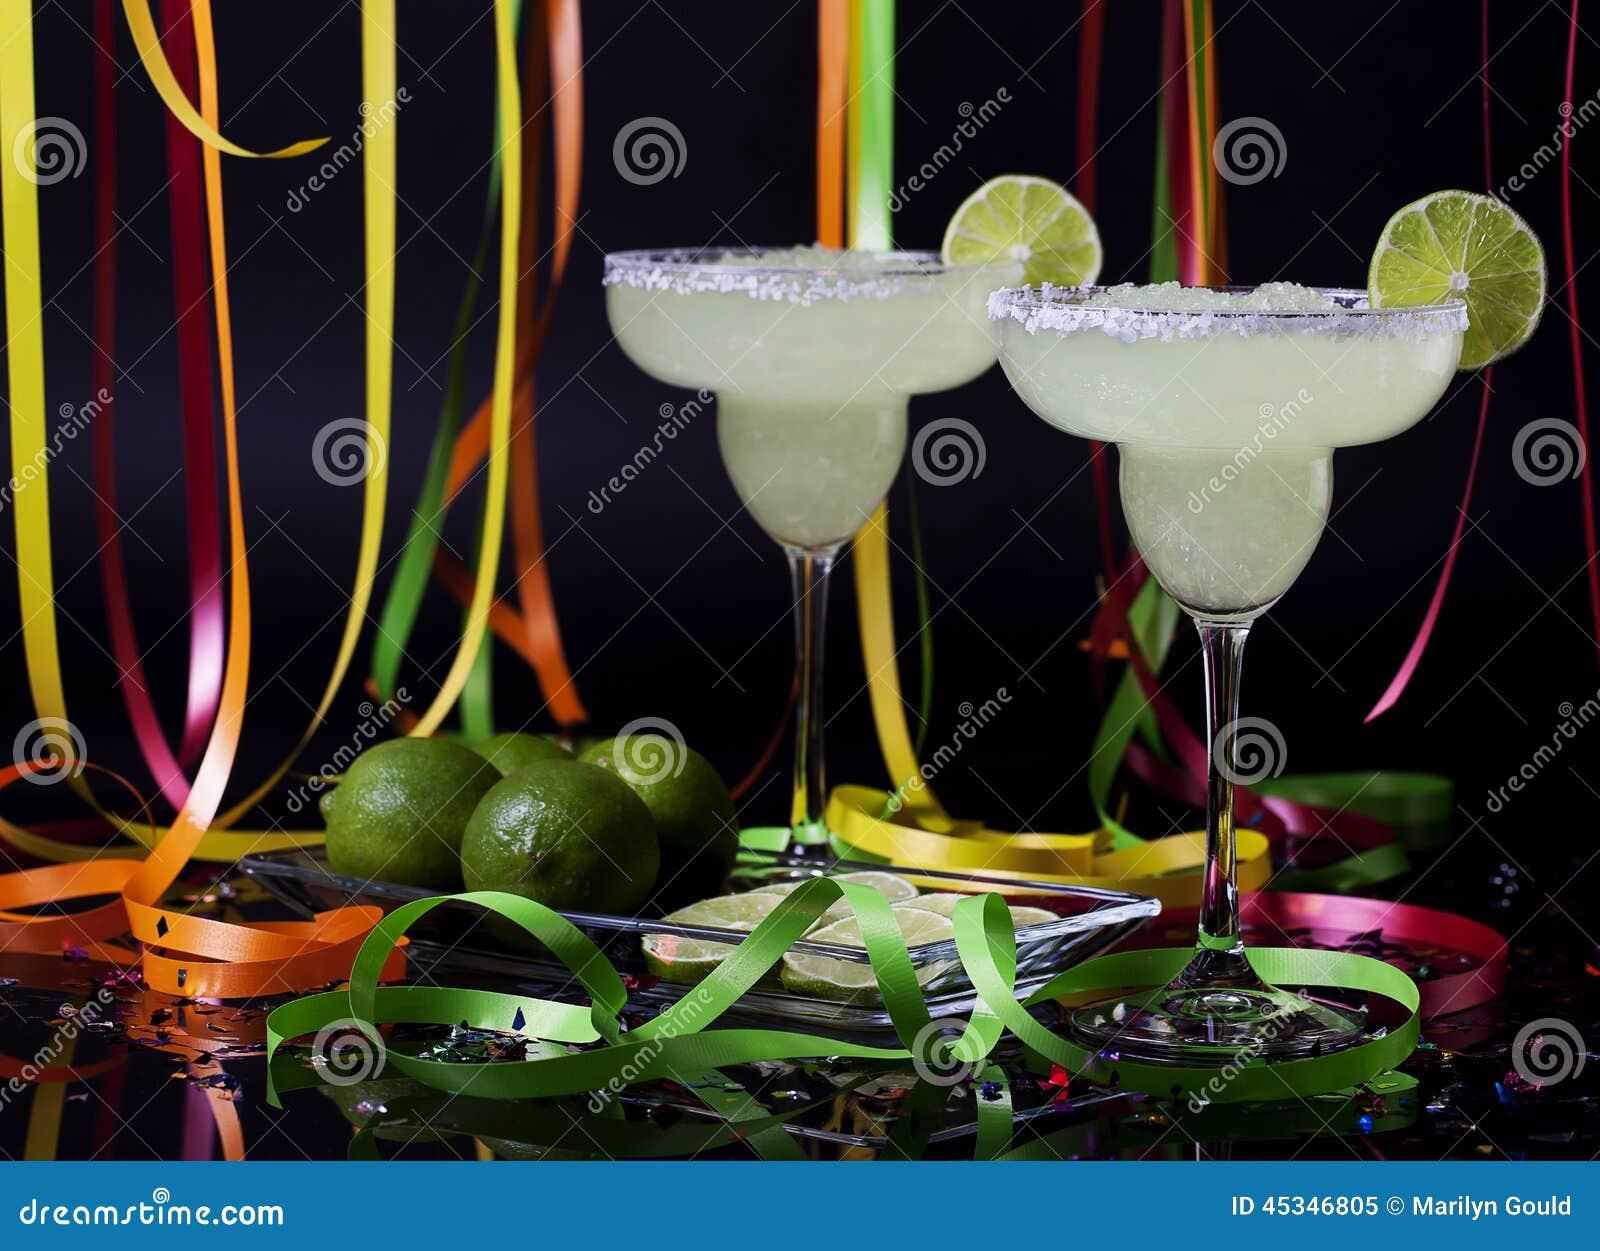 Margarita Party Cocktails